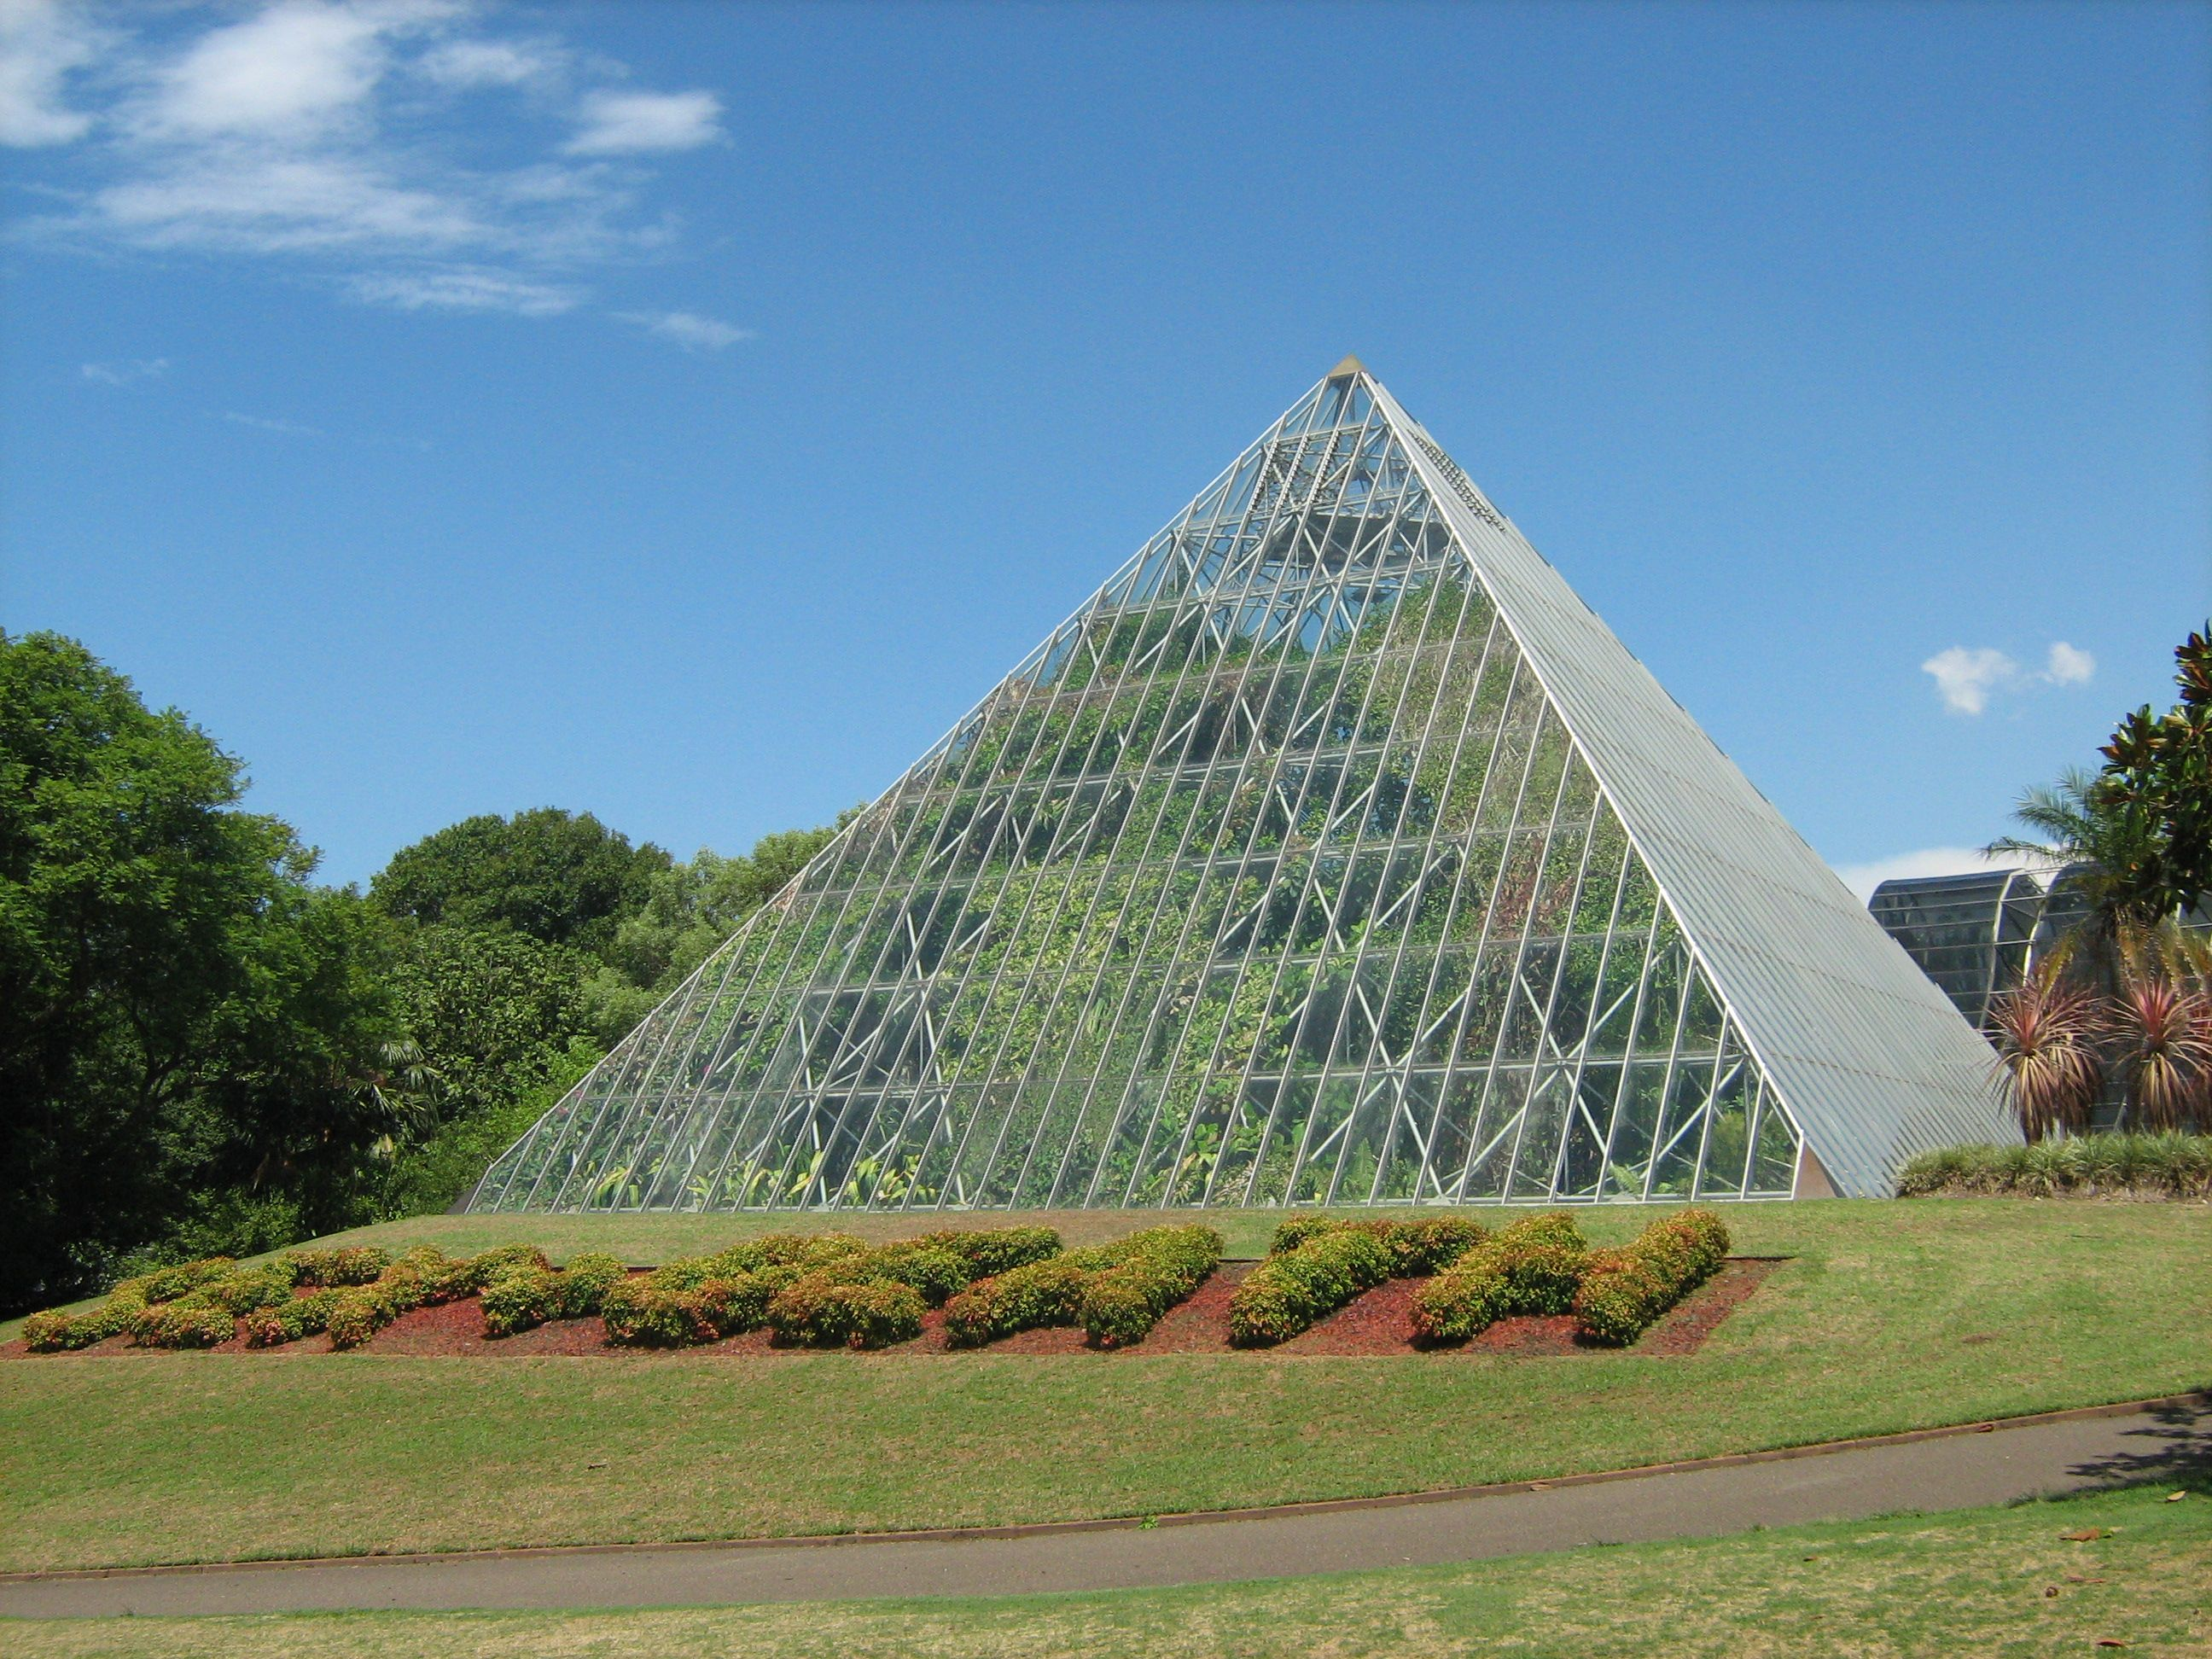 14e0429c987ccdd3c728e8ec78c73bb5 - What To Do In Royal Botanic Gardens Sydney